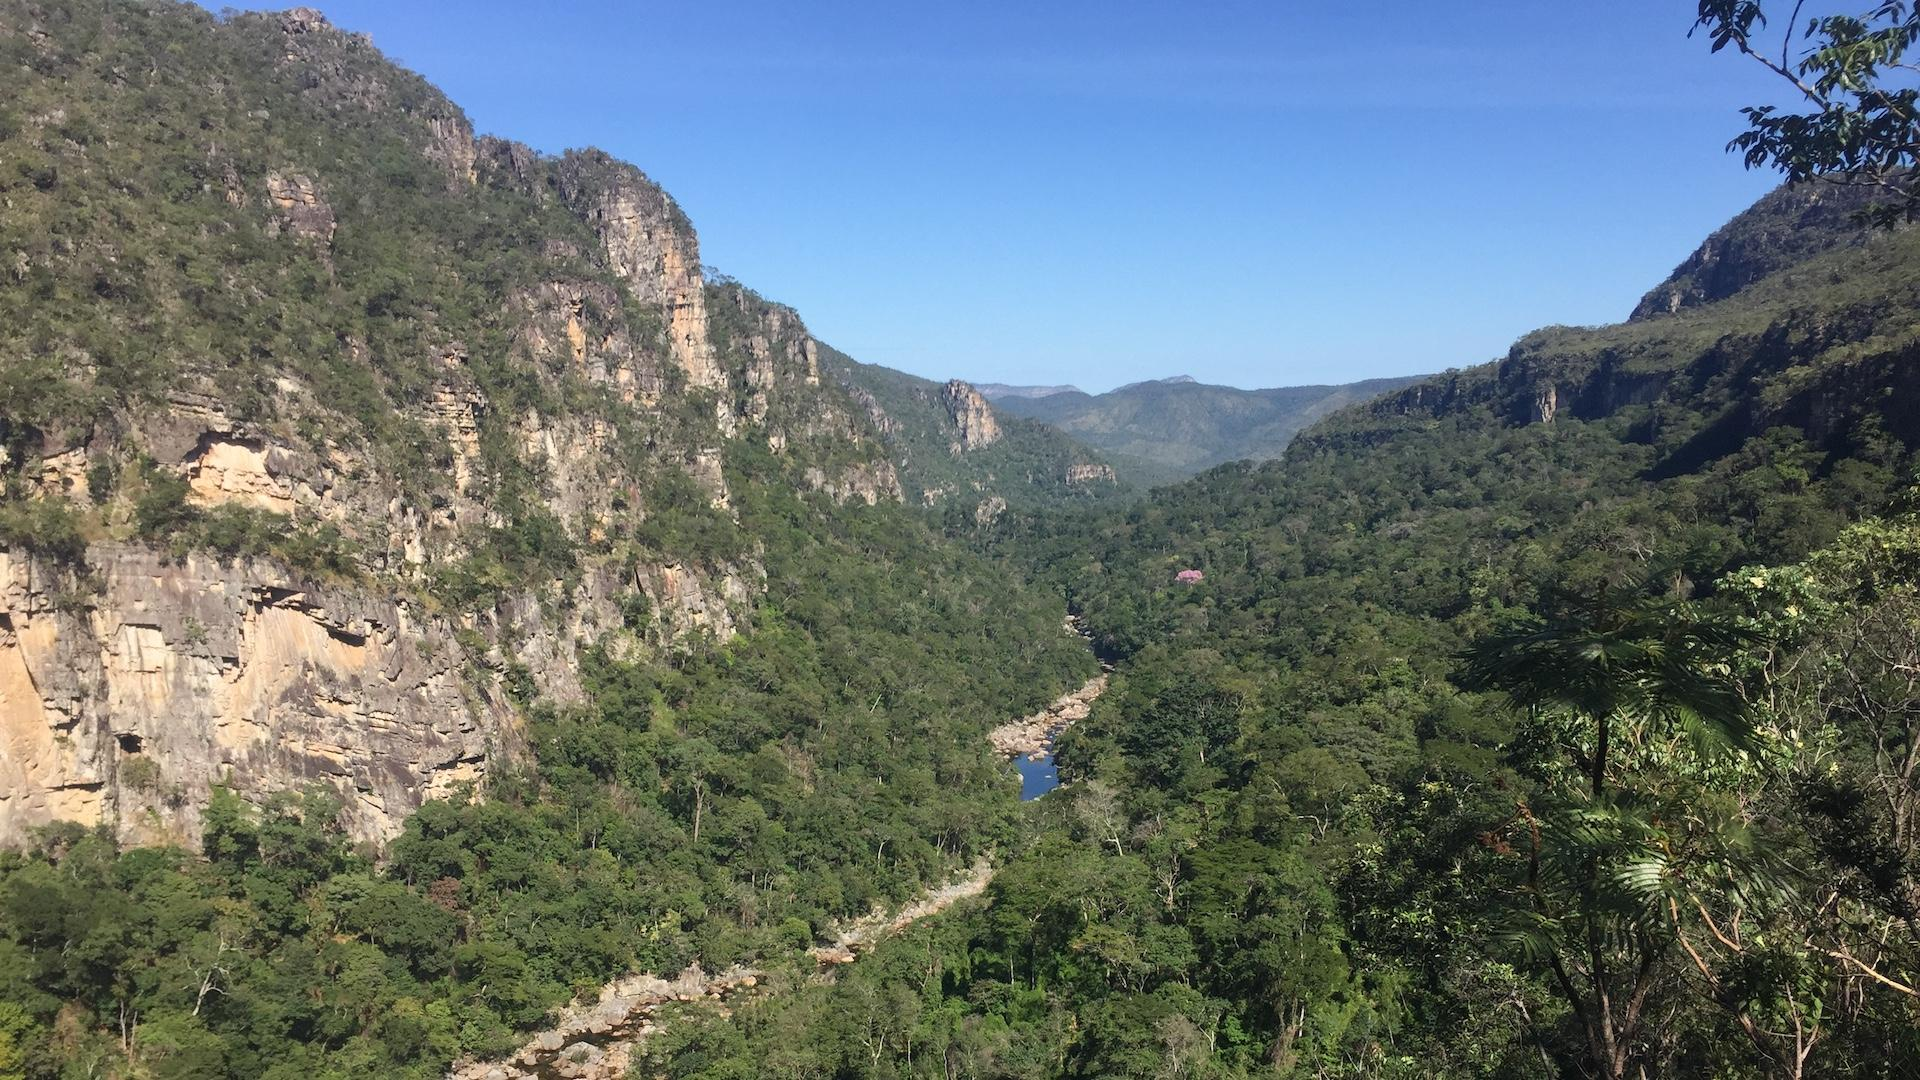 Ausblick ins Grüne 5 Tage Mietwagenreise Chapada dos Veadeiros